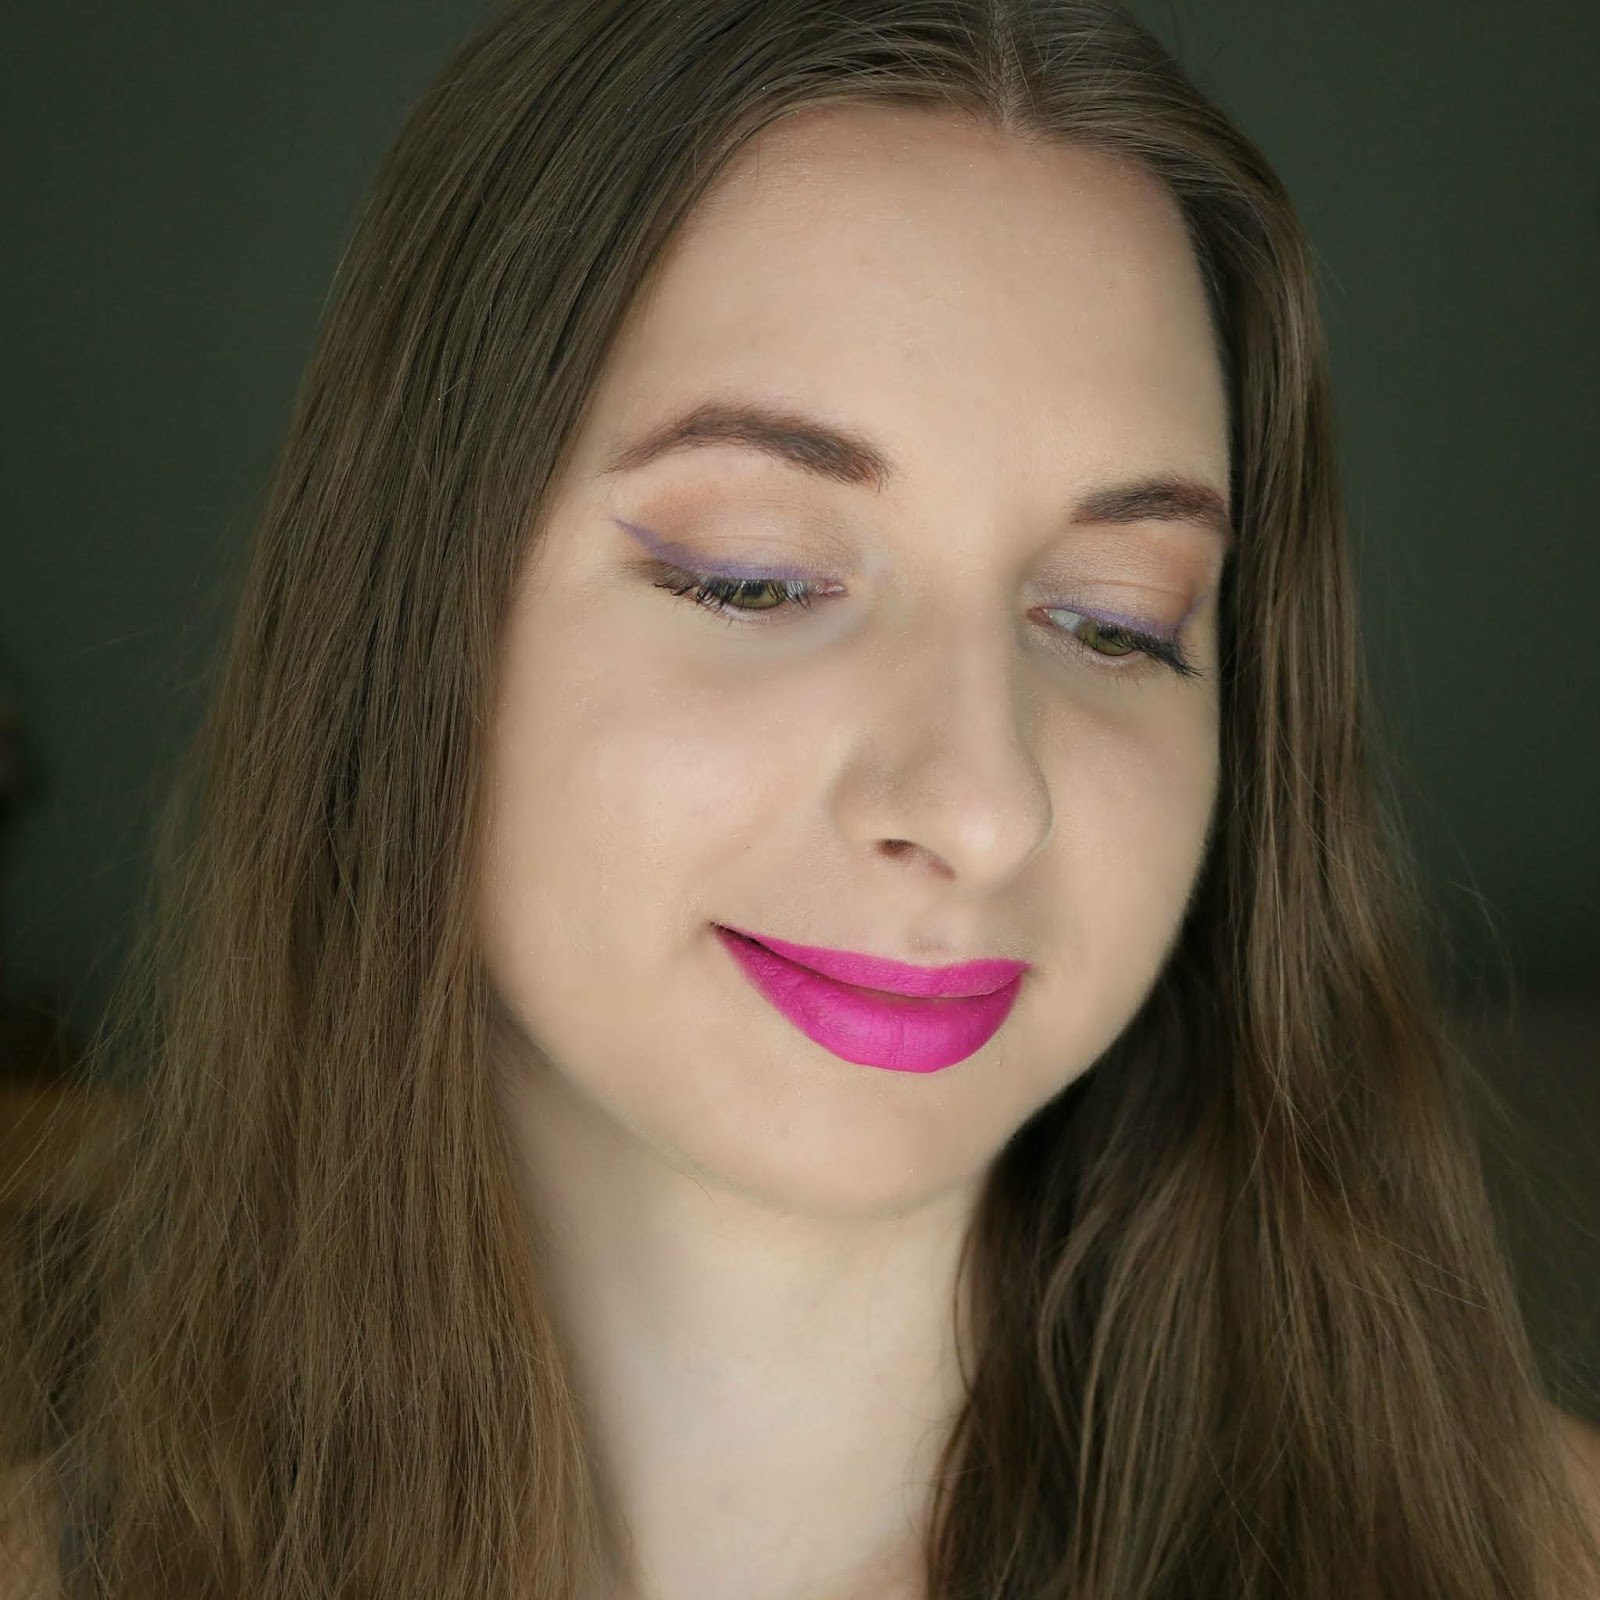 Make Up For Ever Artist Color Pencils Makeup Look